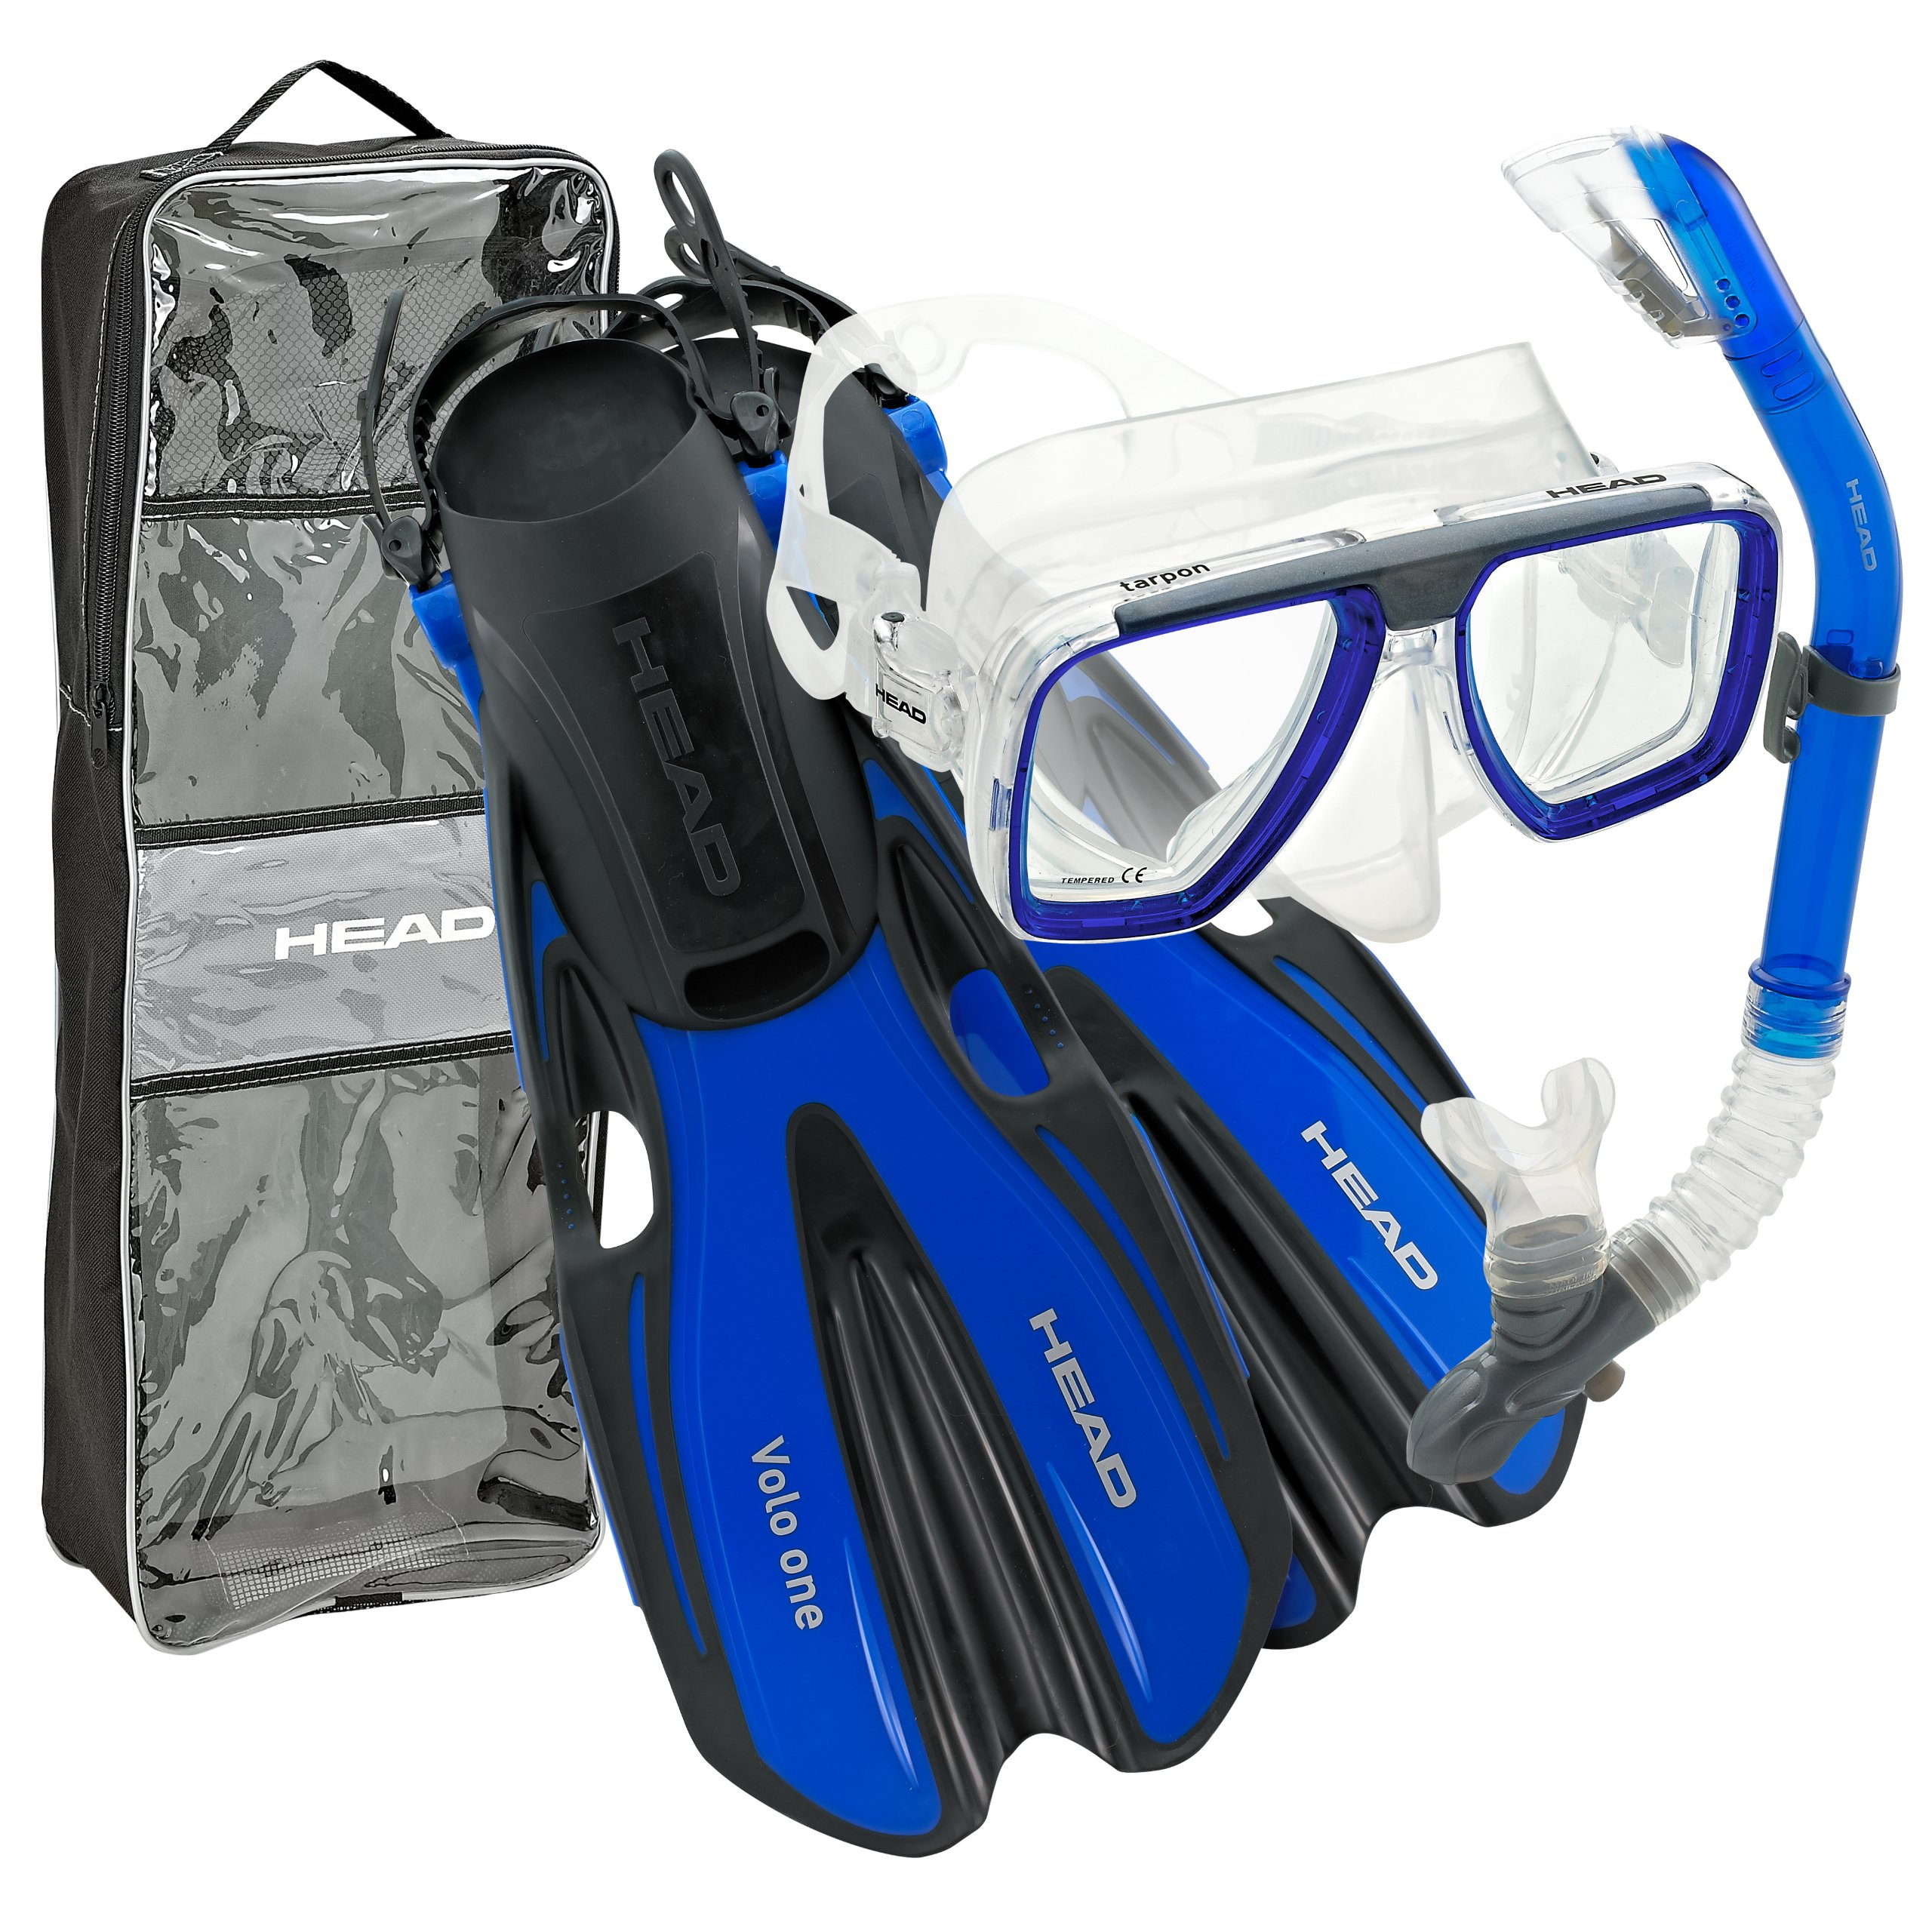 HEAD by Mares Tarpon Travel Friendly Premium Mask Fin Snorkel Set, Blue, Medium, (7-10)